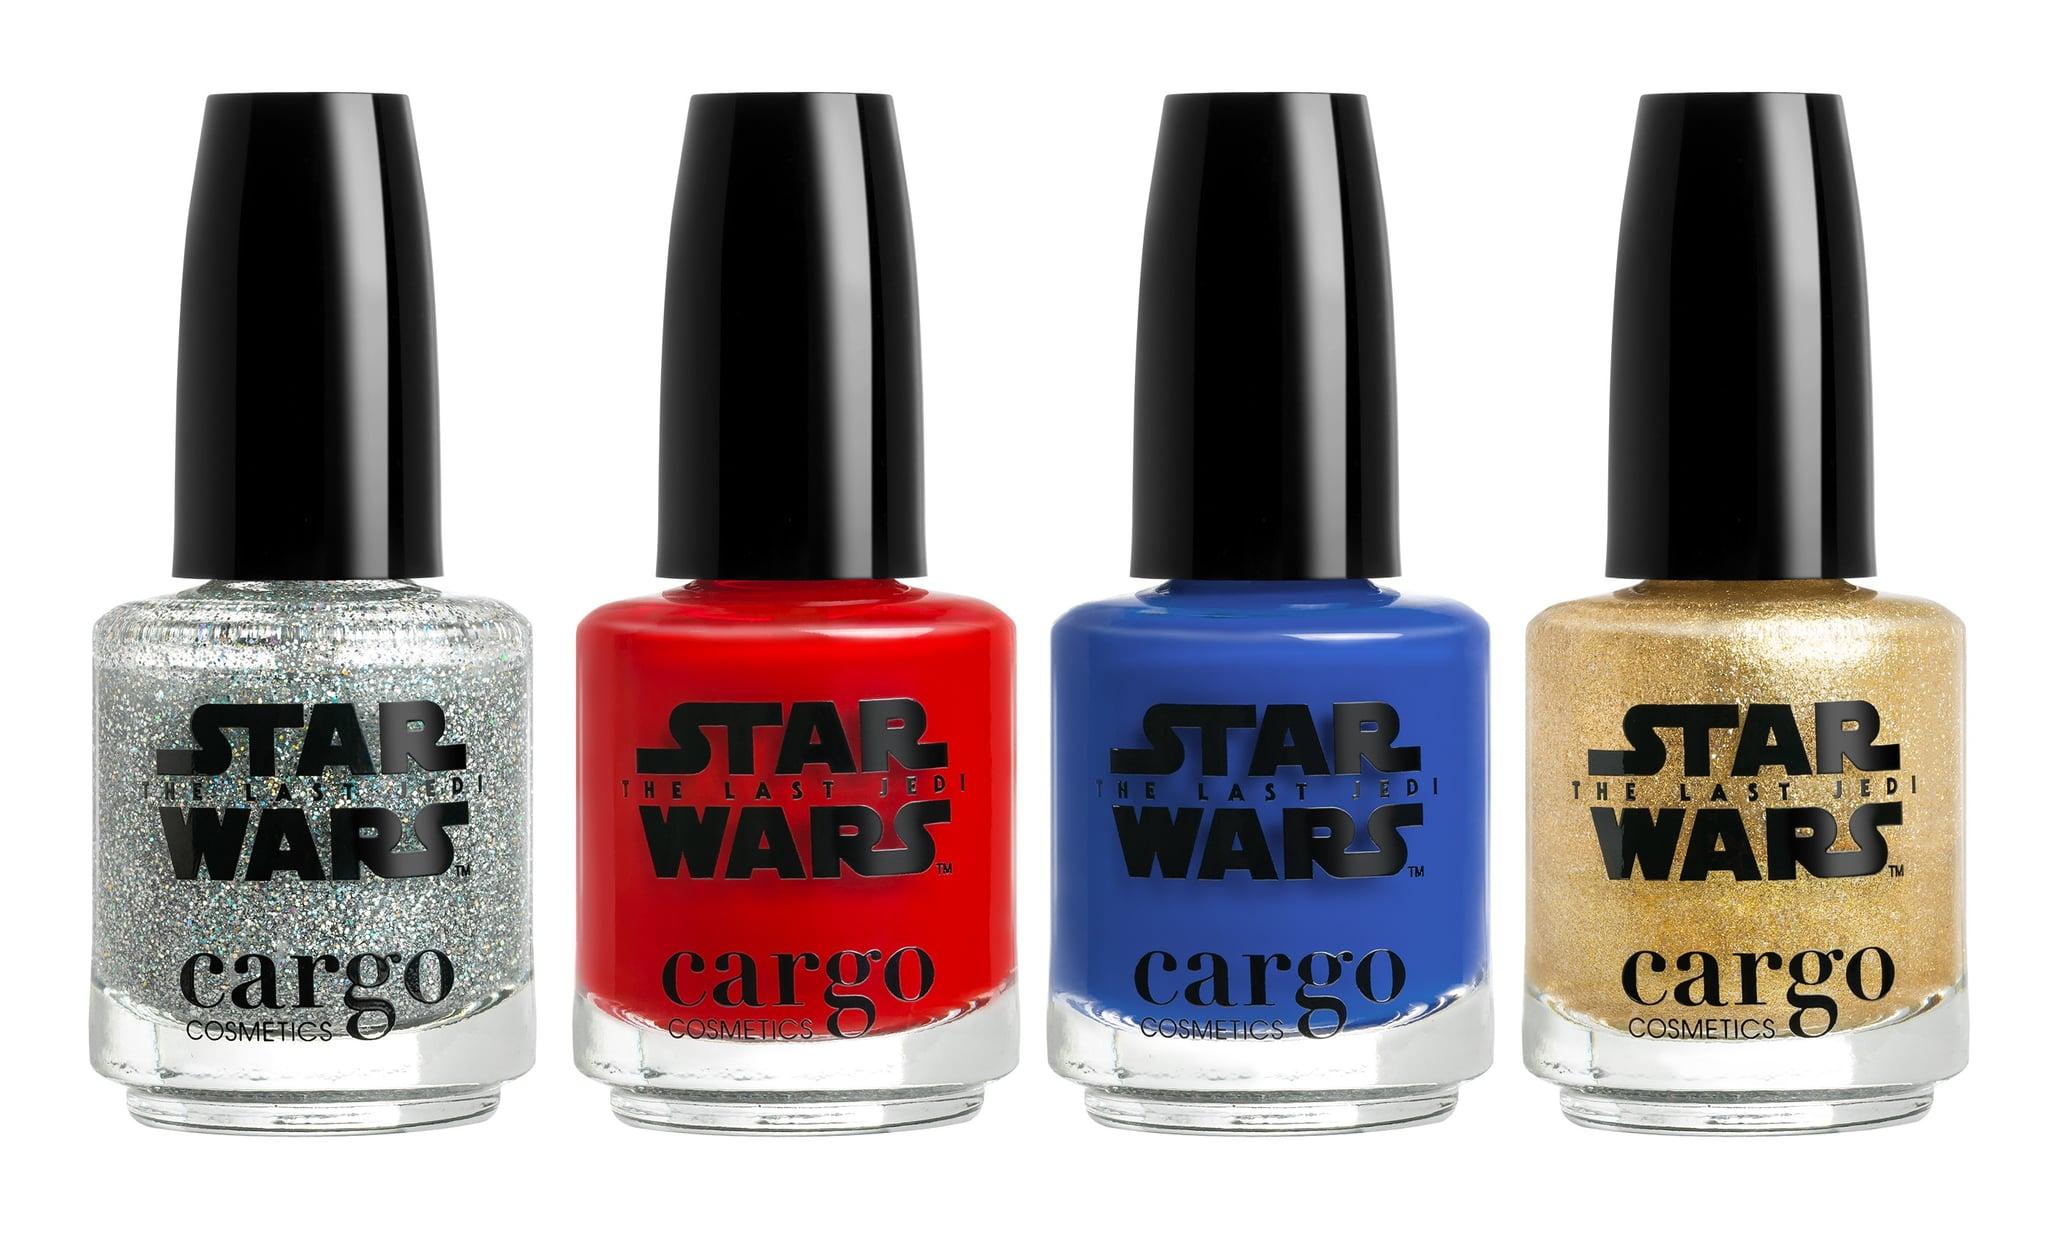 Cargo Launches Star Wars Nail Polish Kit | POPSUGAR Beauty